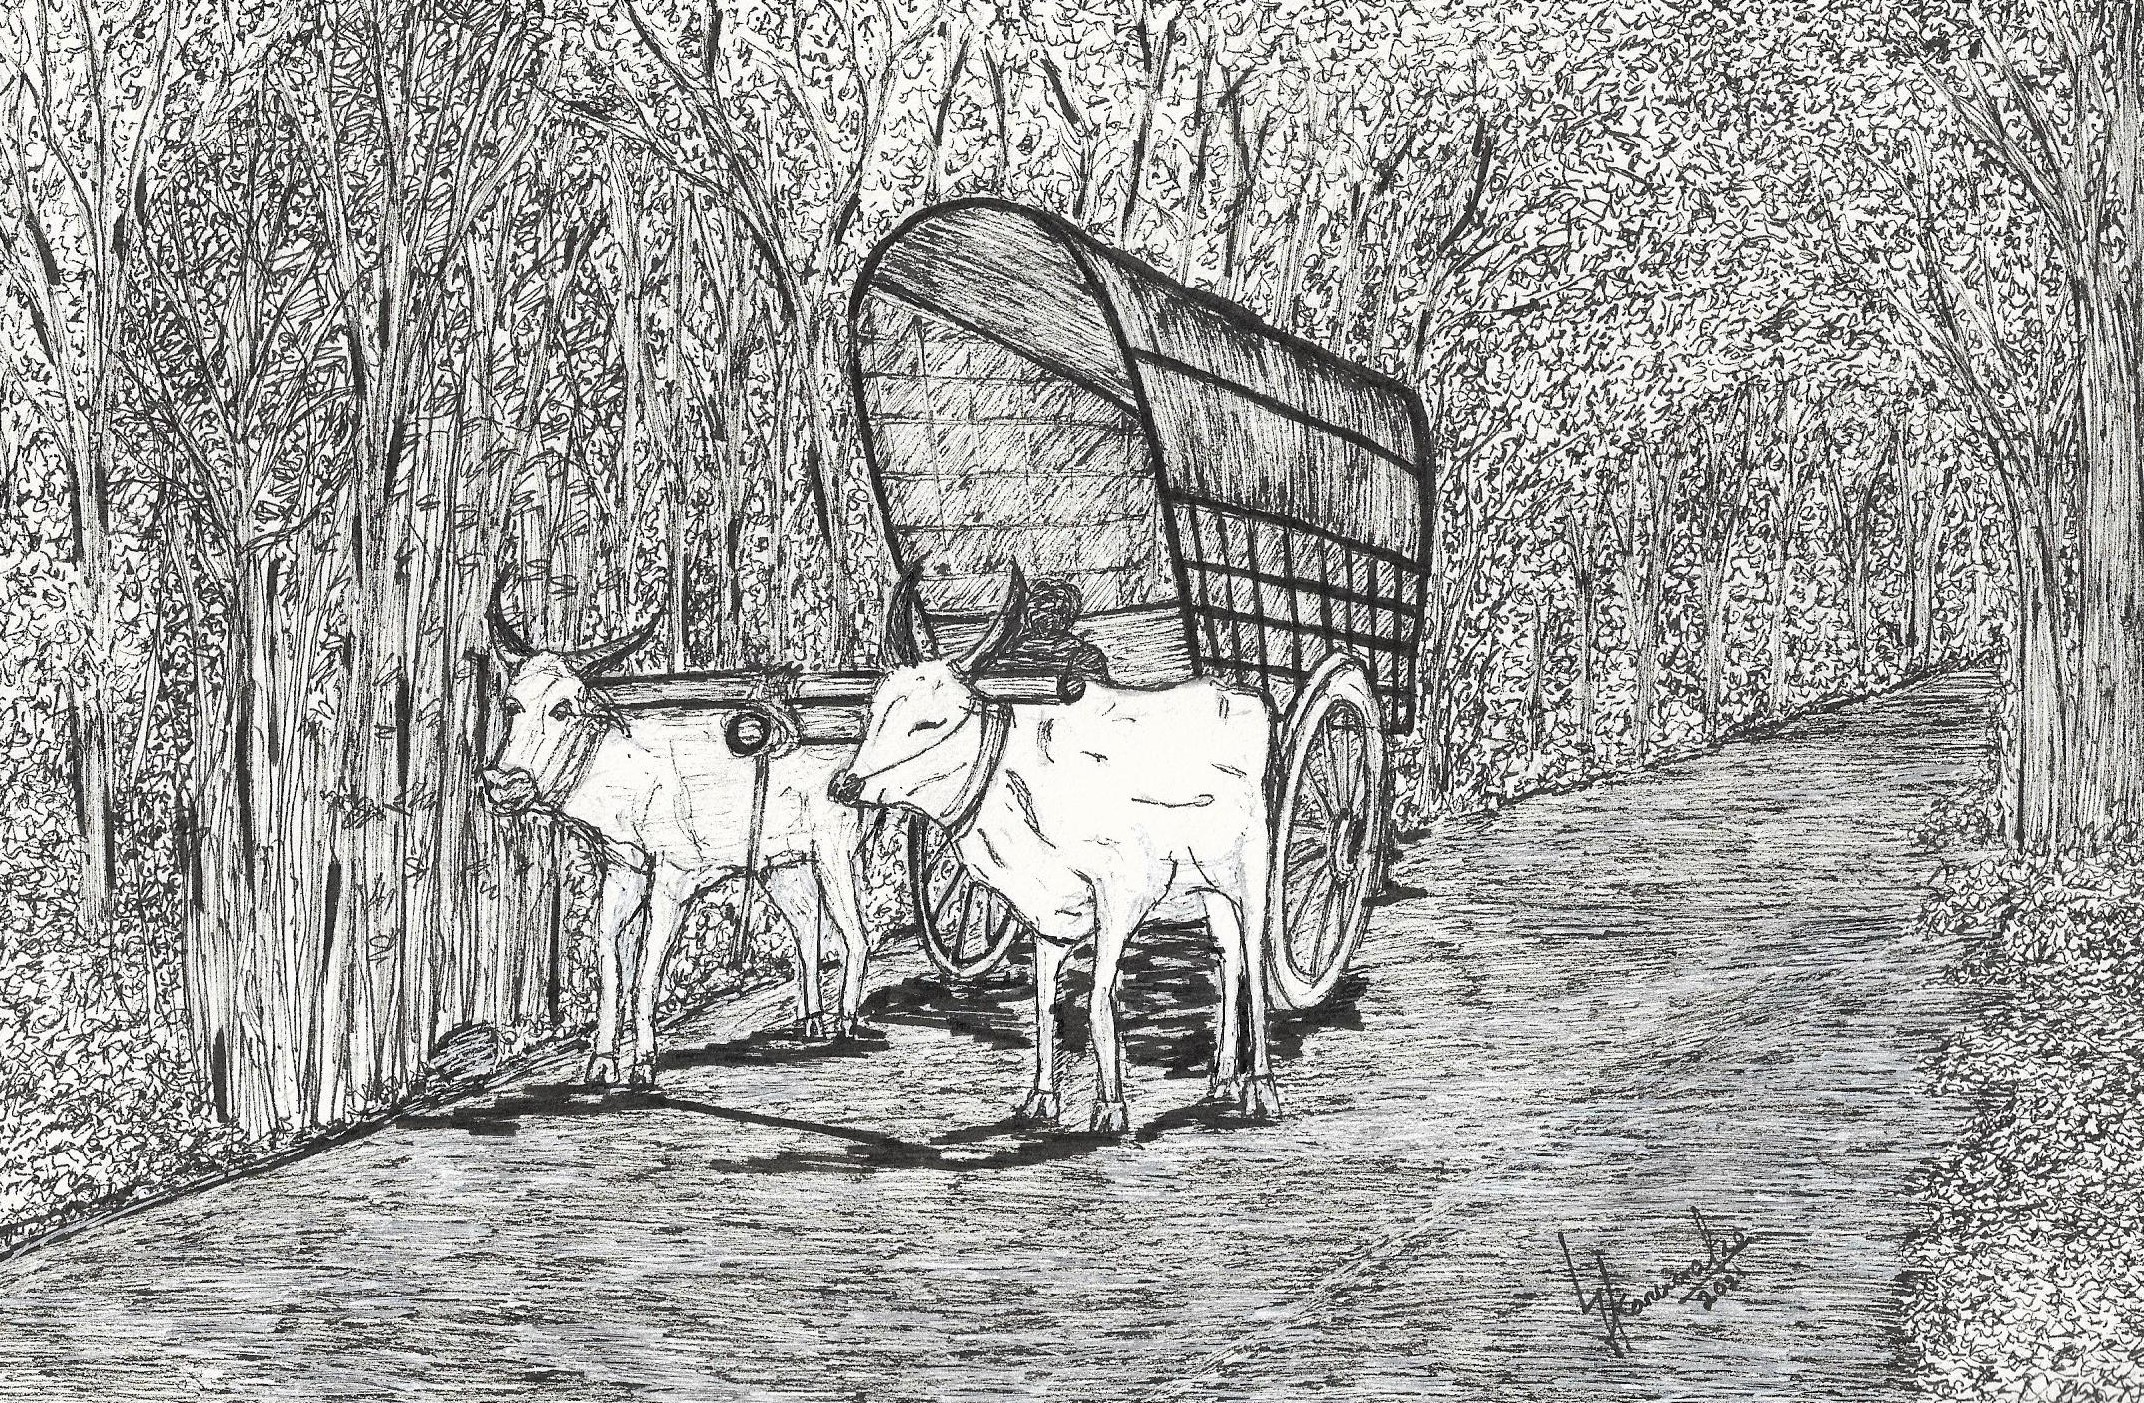 Bullock Cart in Ceylon by Car Artist Lahiru